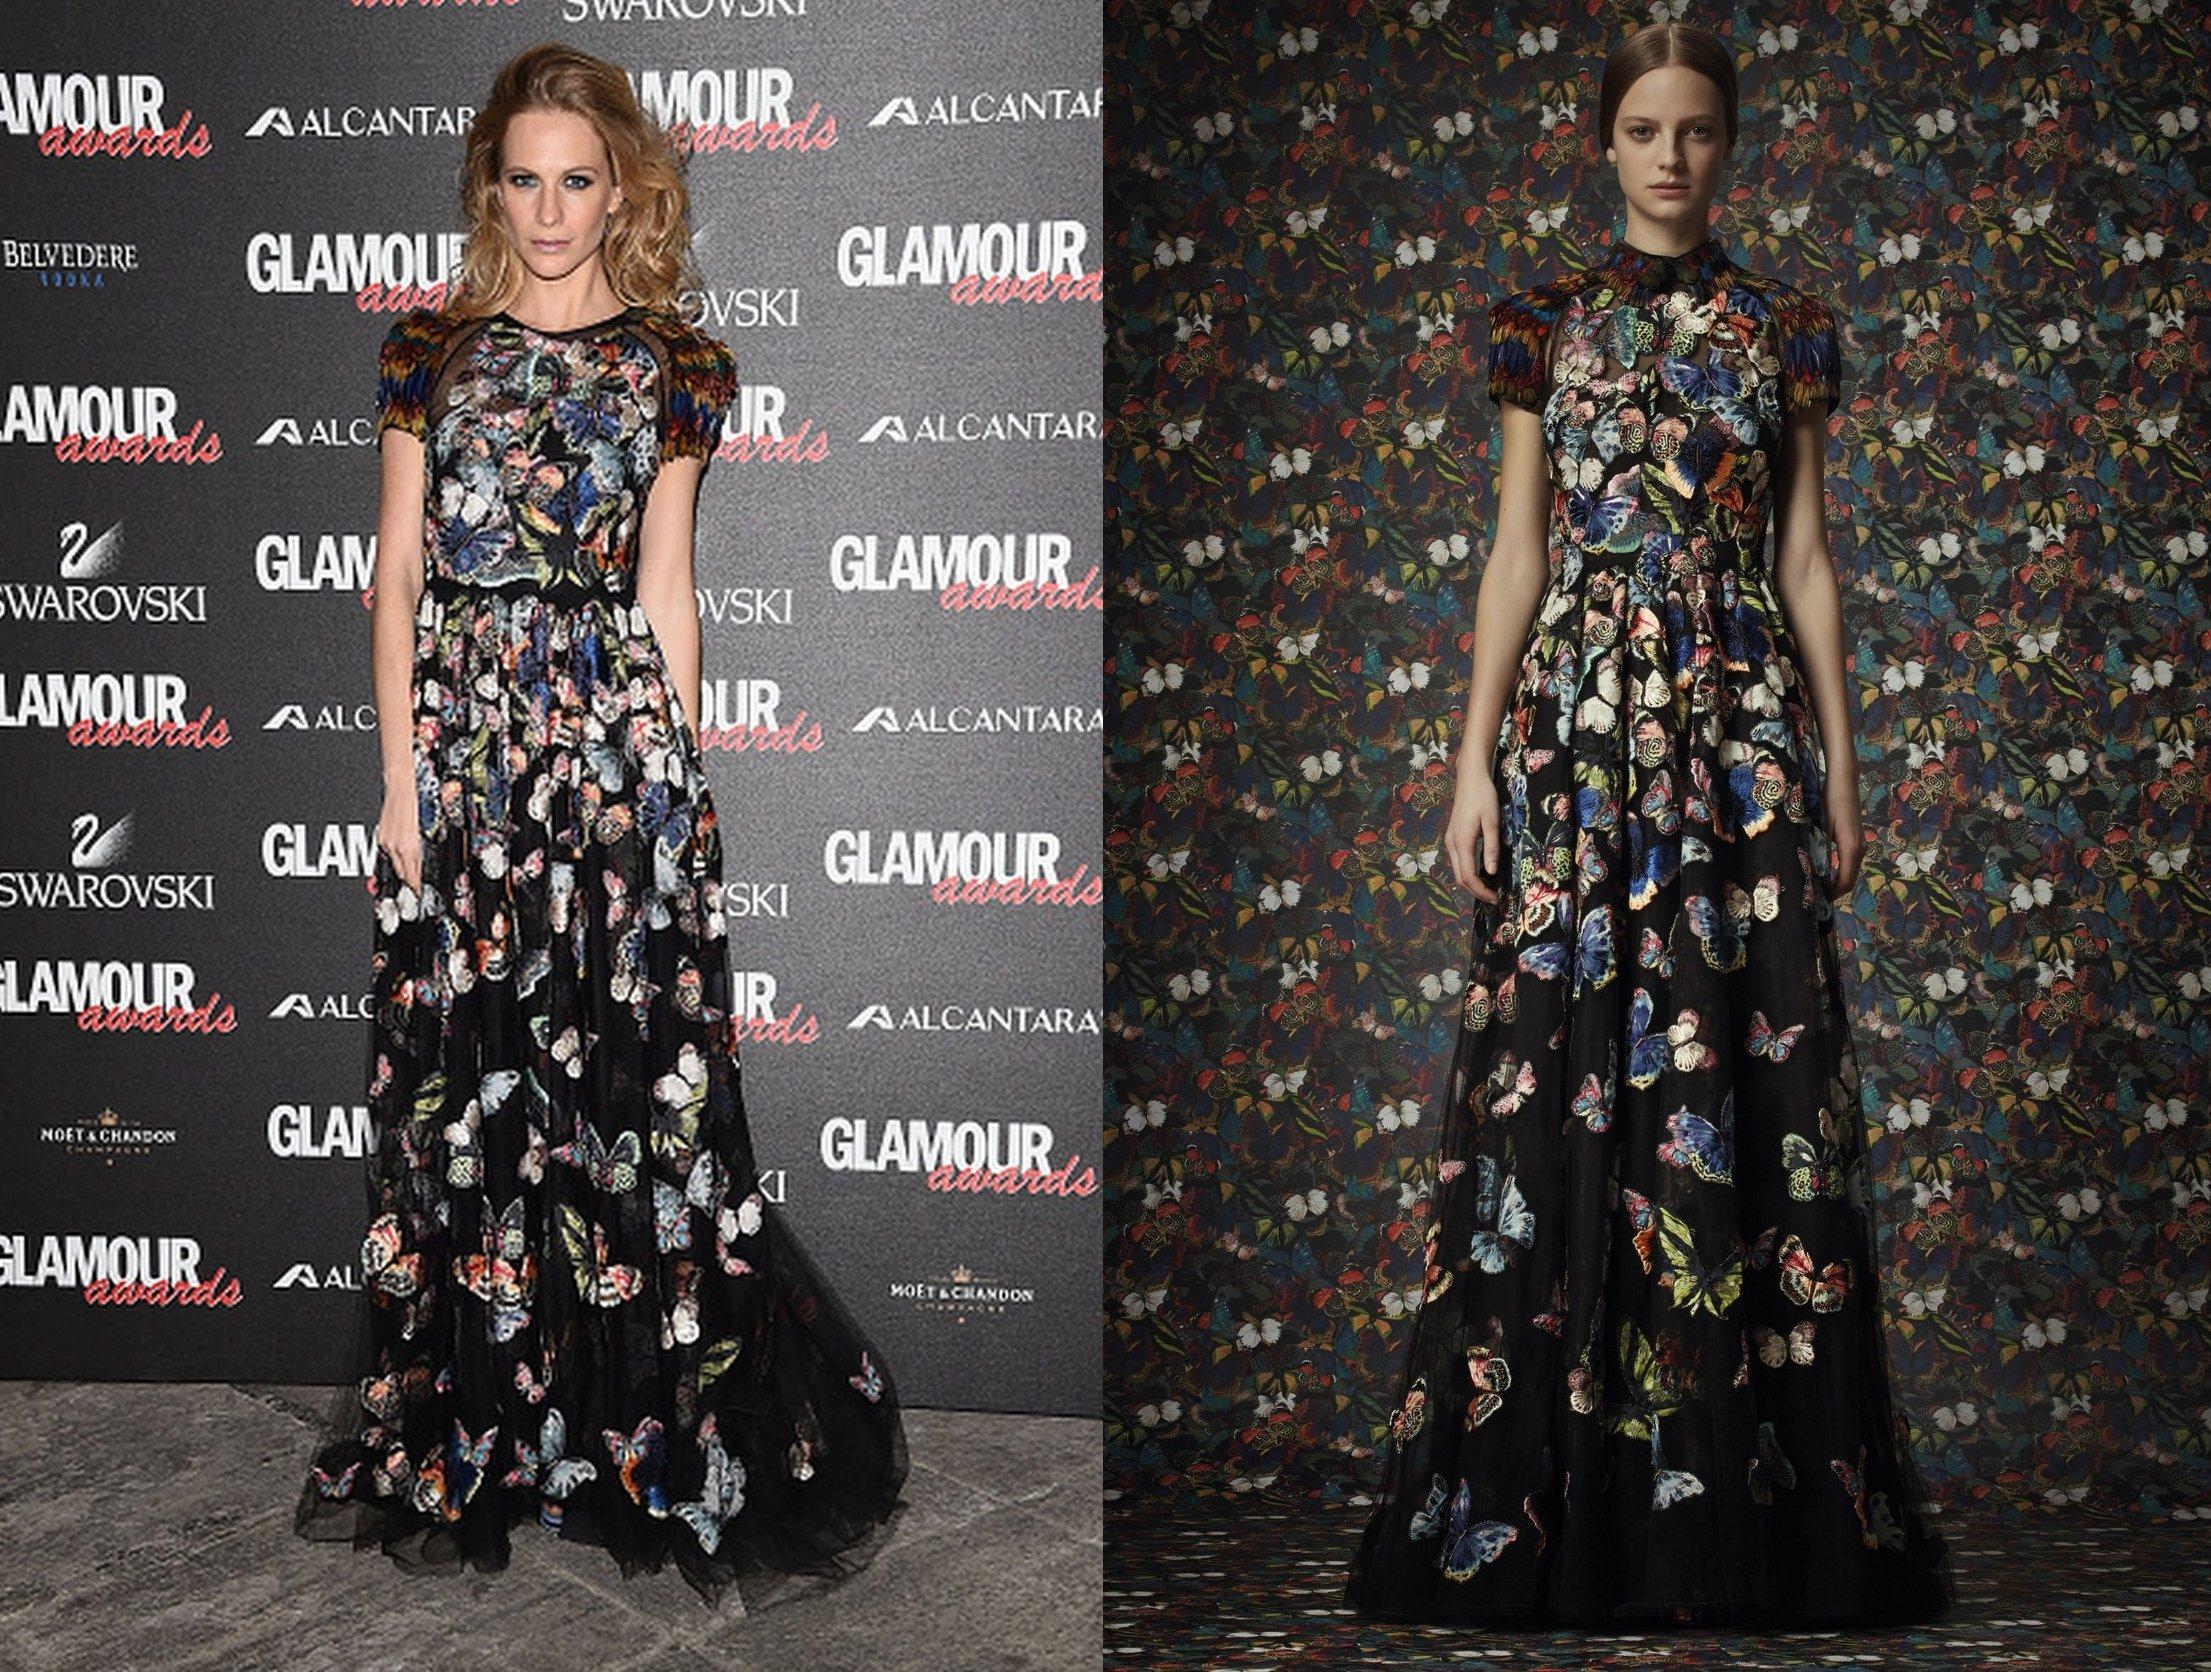 poppy-delevigne-wearing-valentino-glamour-awards-2014